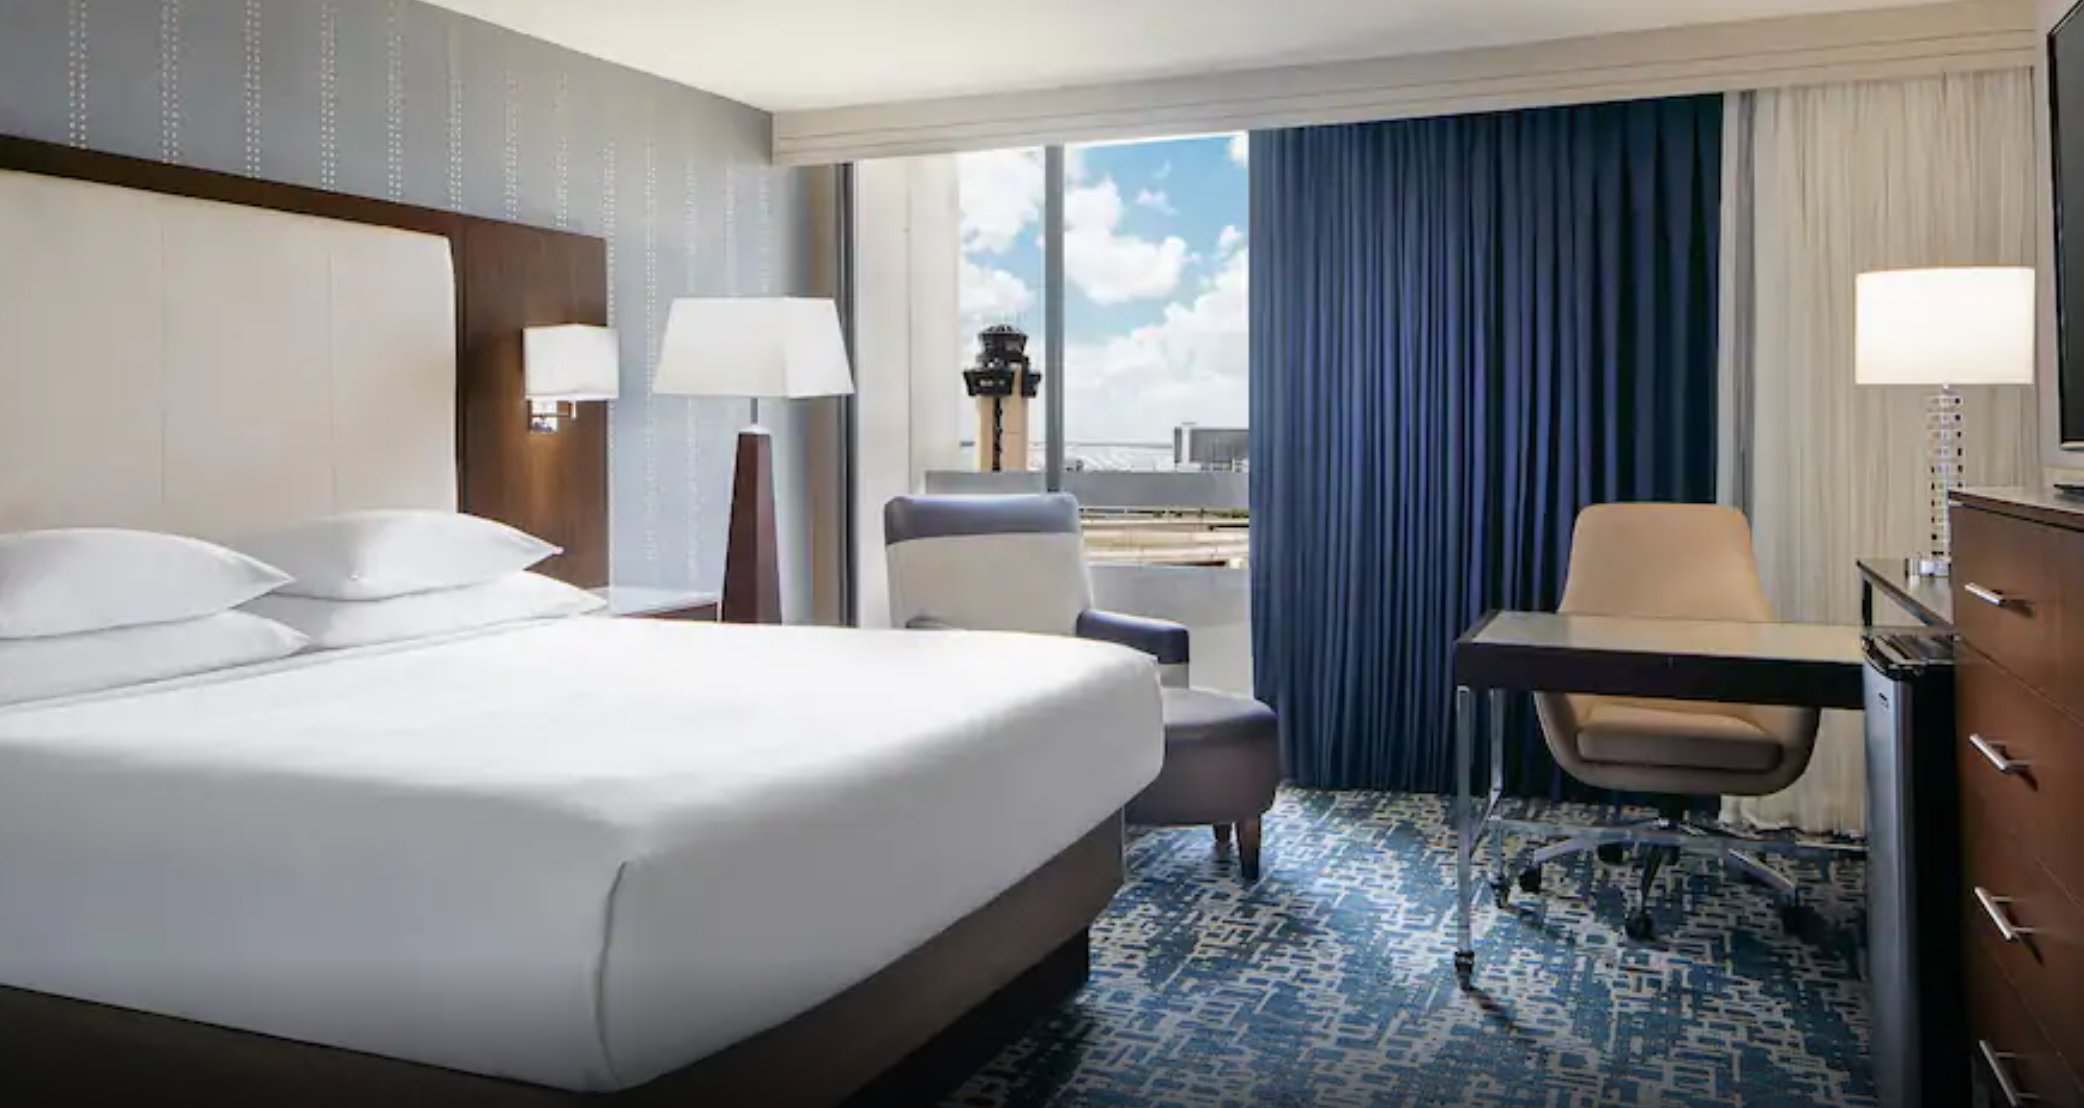 https://www.hotelsbyday.com/_data/default-hotel_image/3/18797/screenshot-2020-06-14-at-8-10-26-am.png